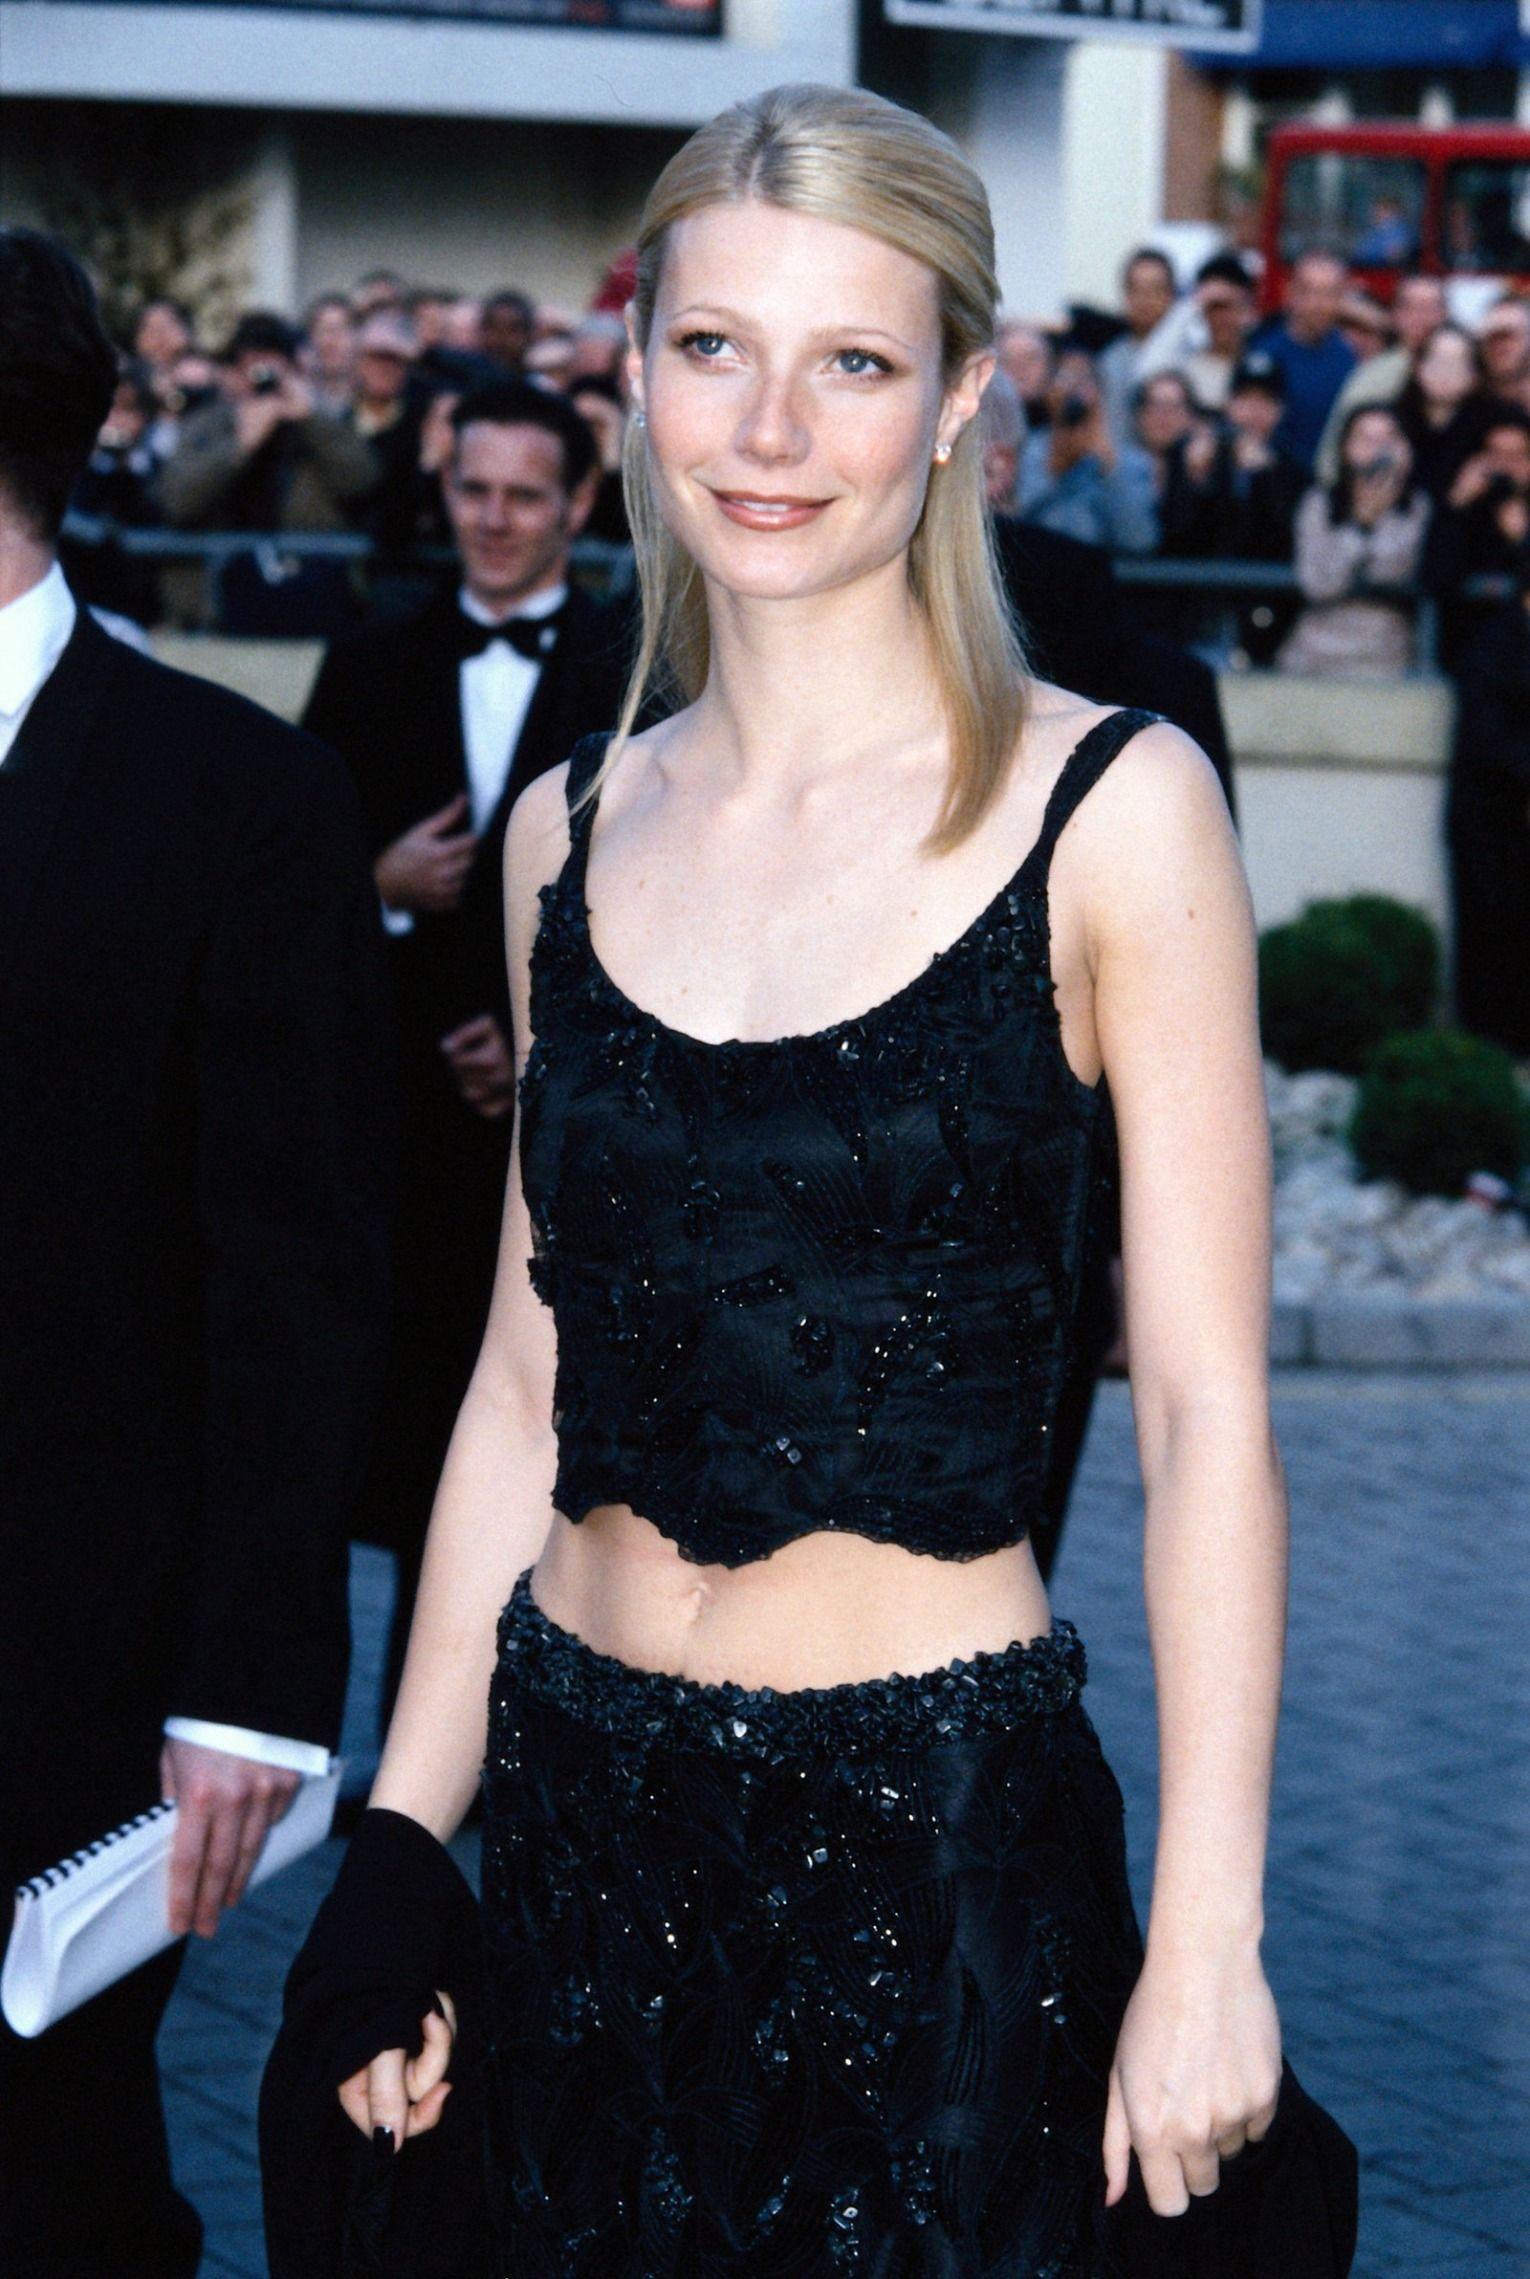 Gwyneth Paltrow at the BAFTA Awards in London, April 1999.